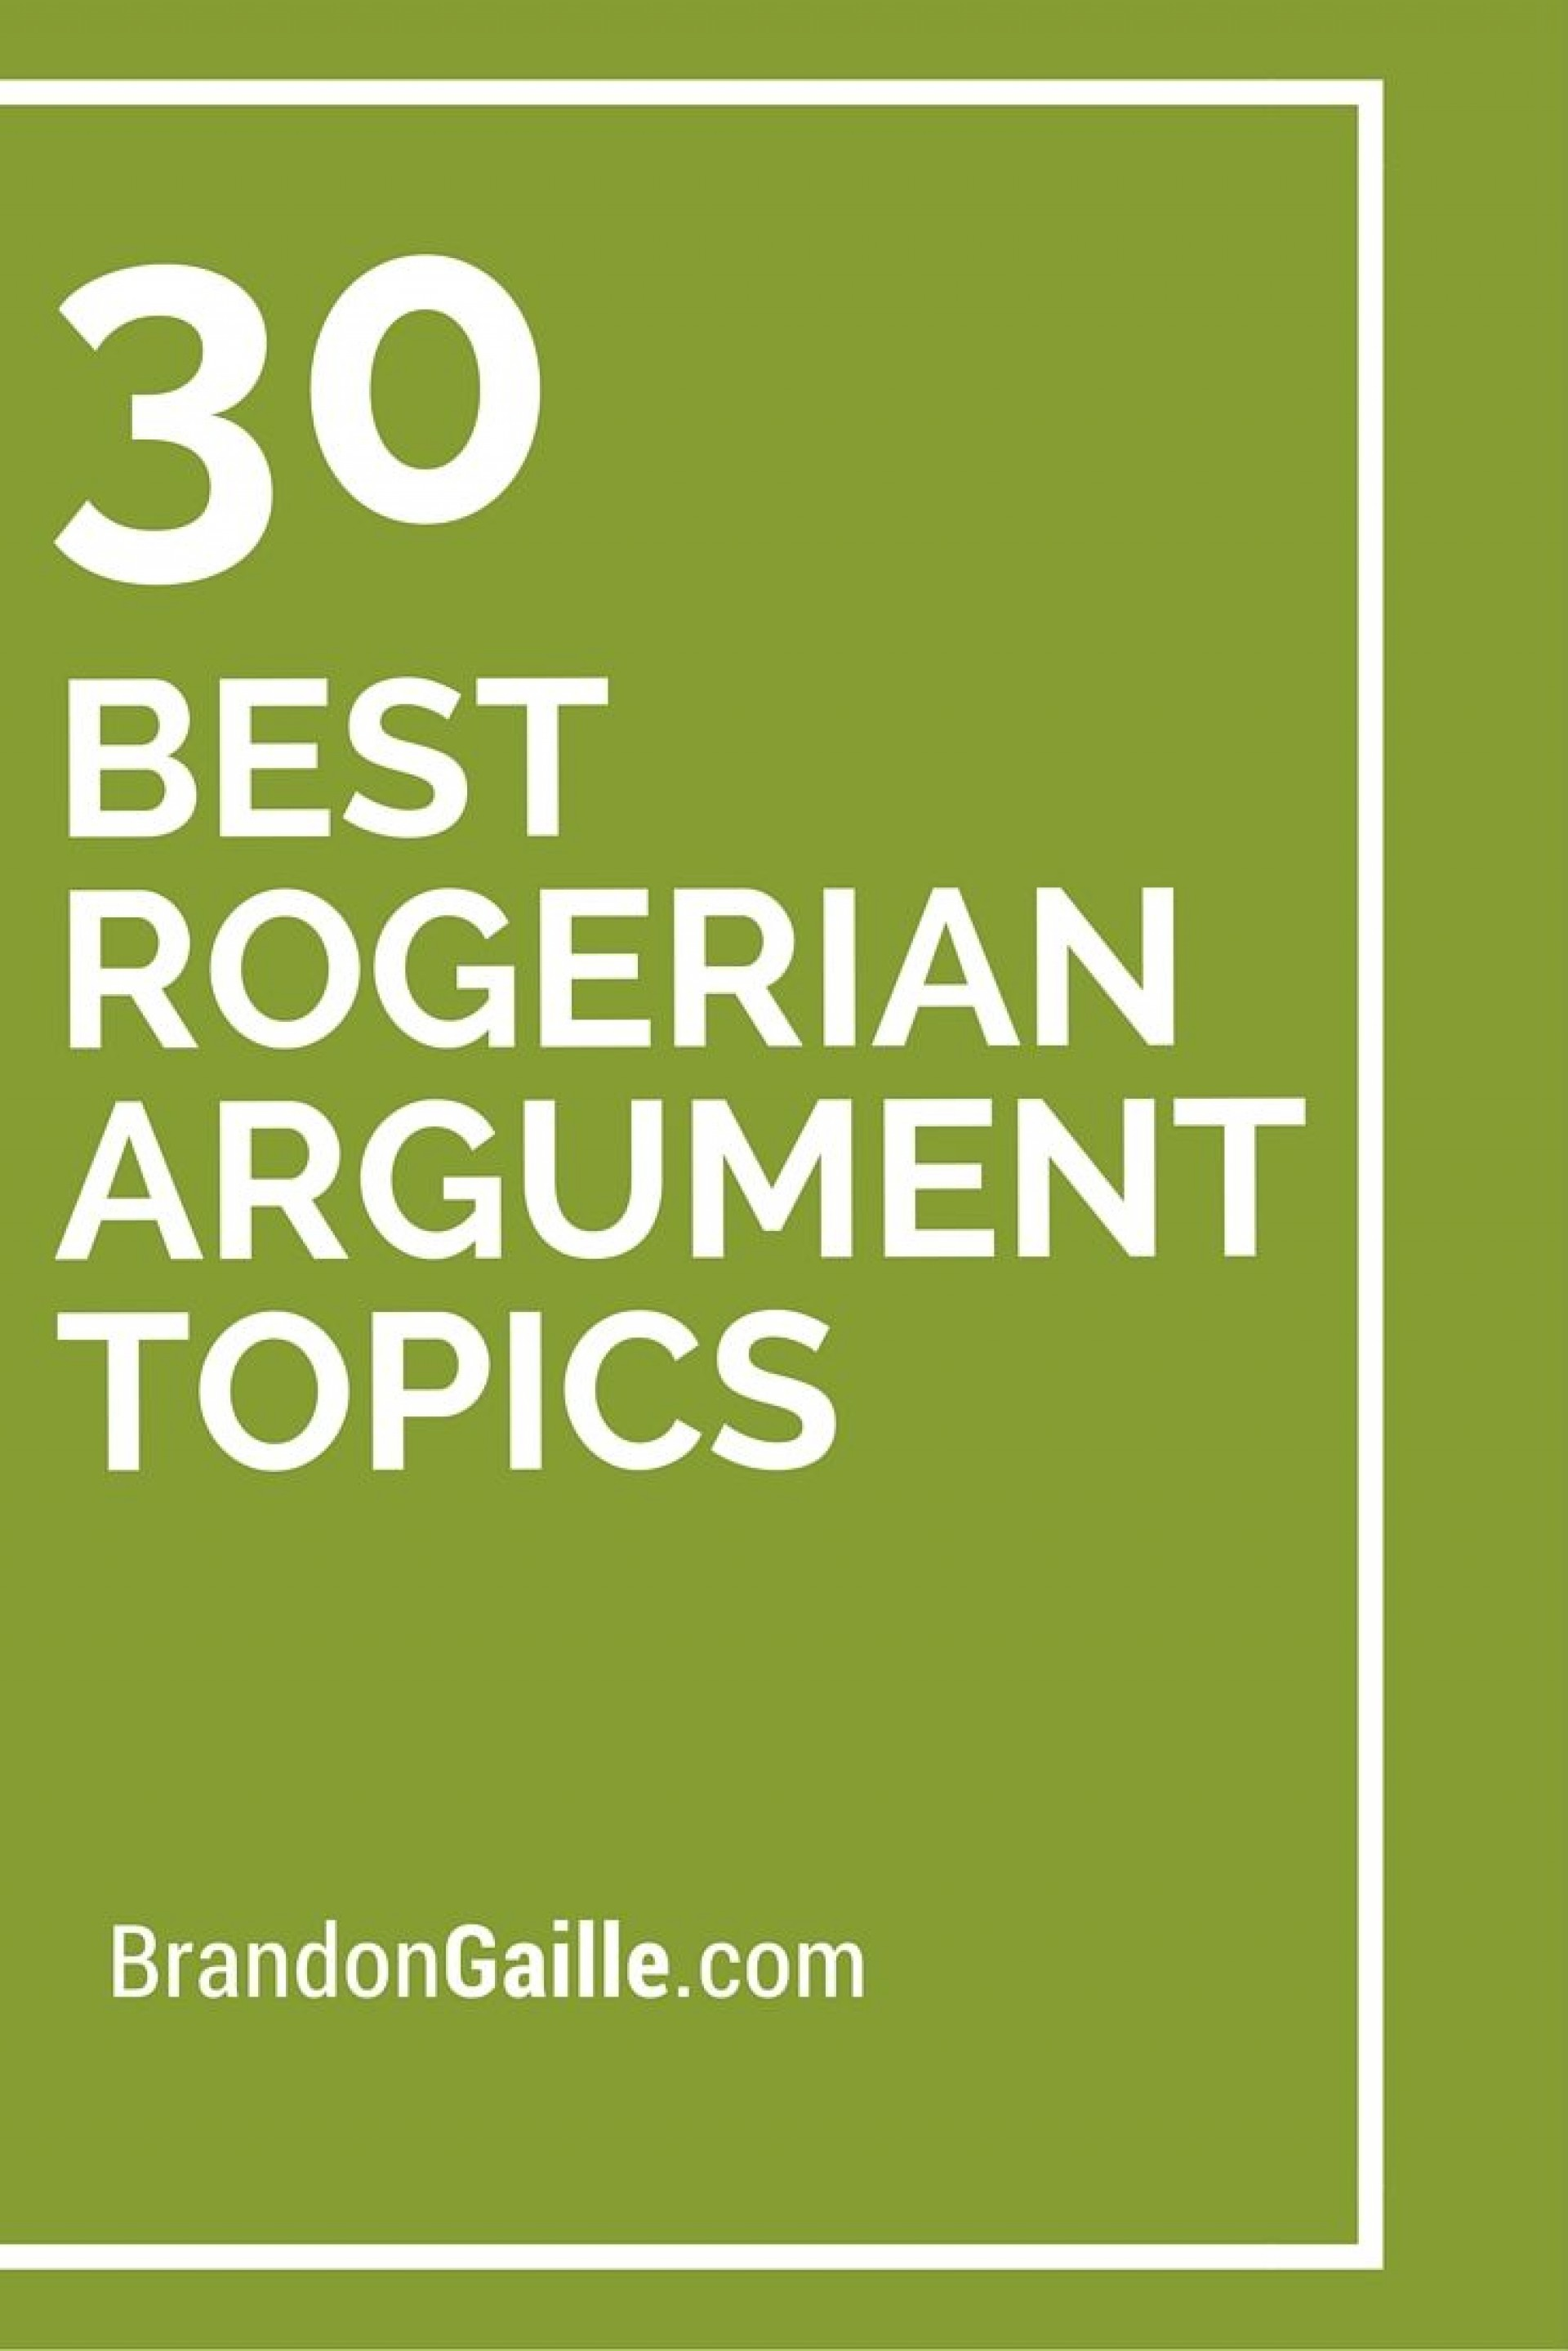 002 Essay Example Rogerian Argument Topics Formidable Topic Ideas 1920